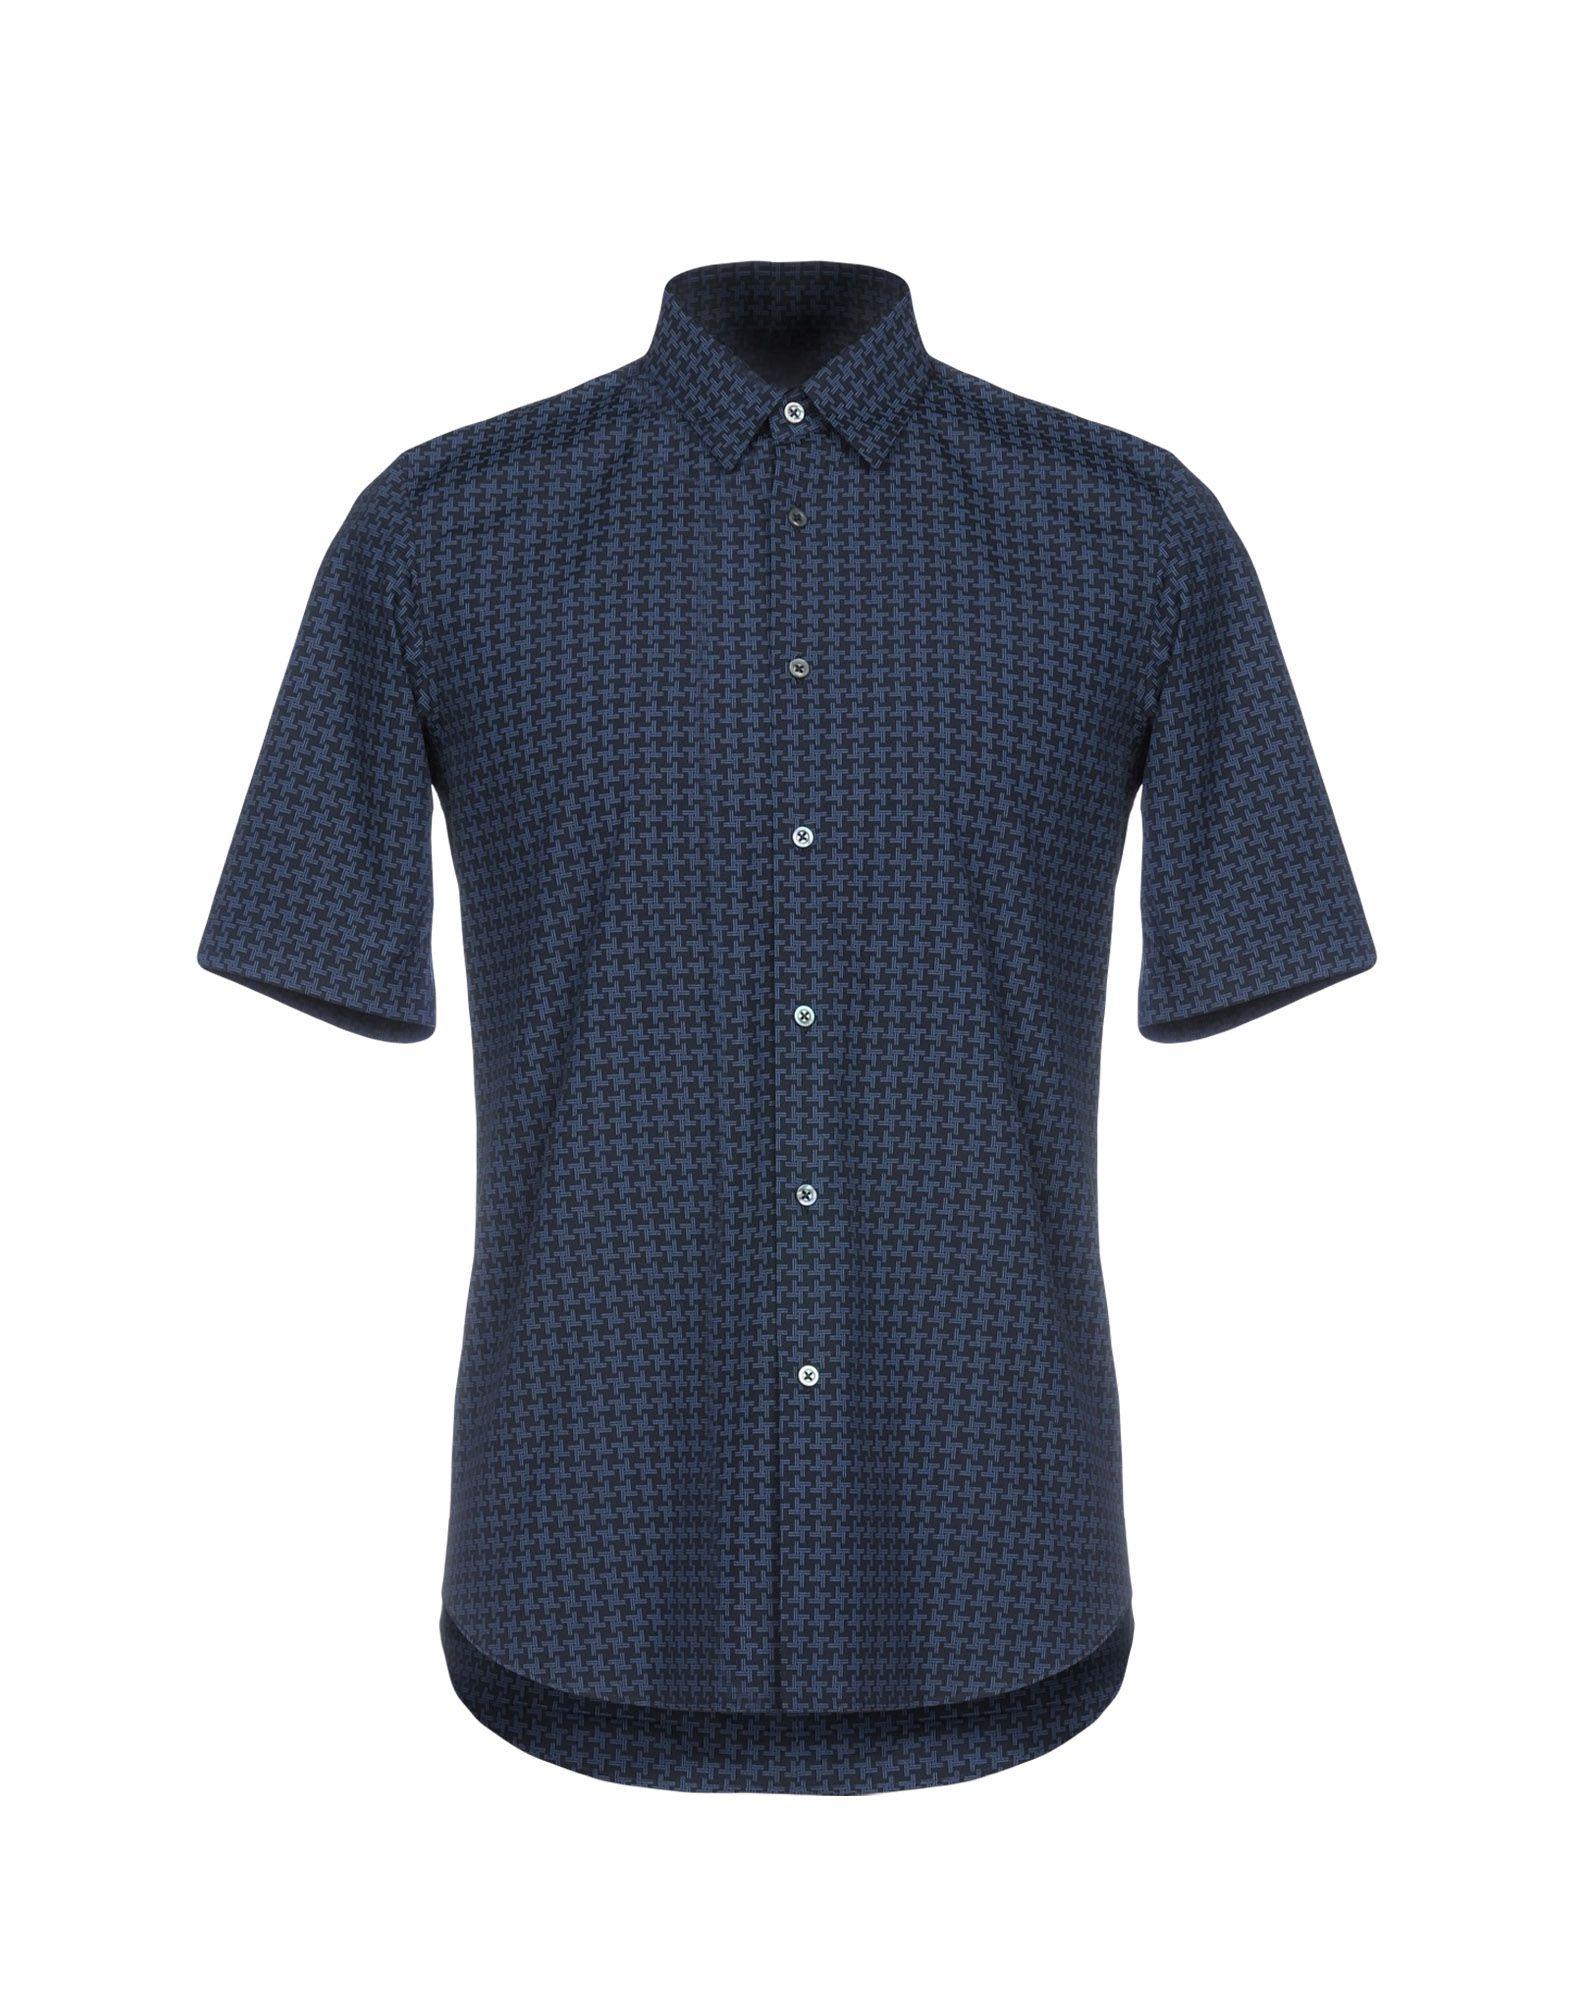 Camicia Fantasia Jil Sander Uomo - Acquista online su